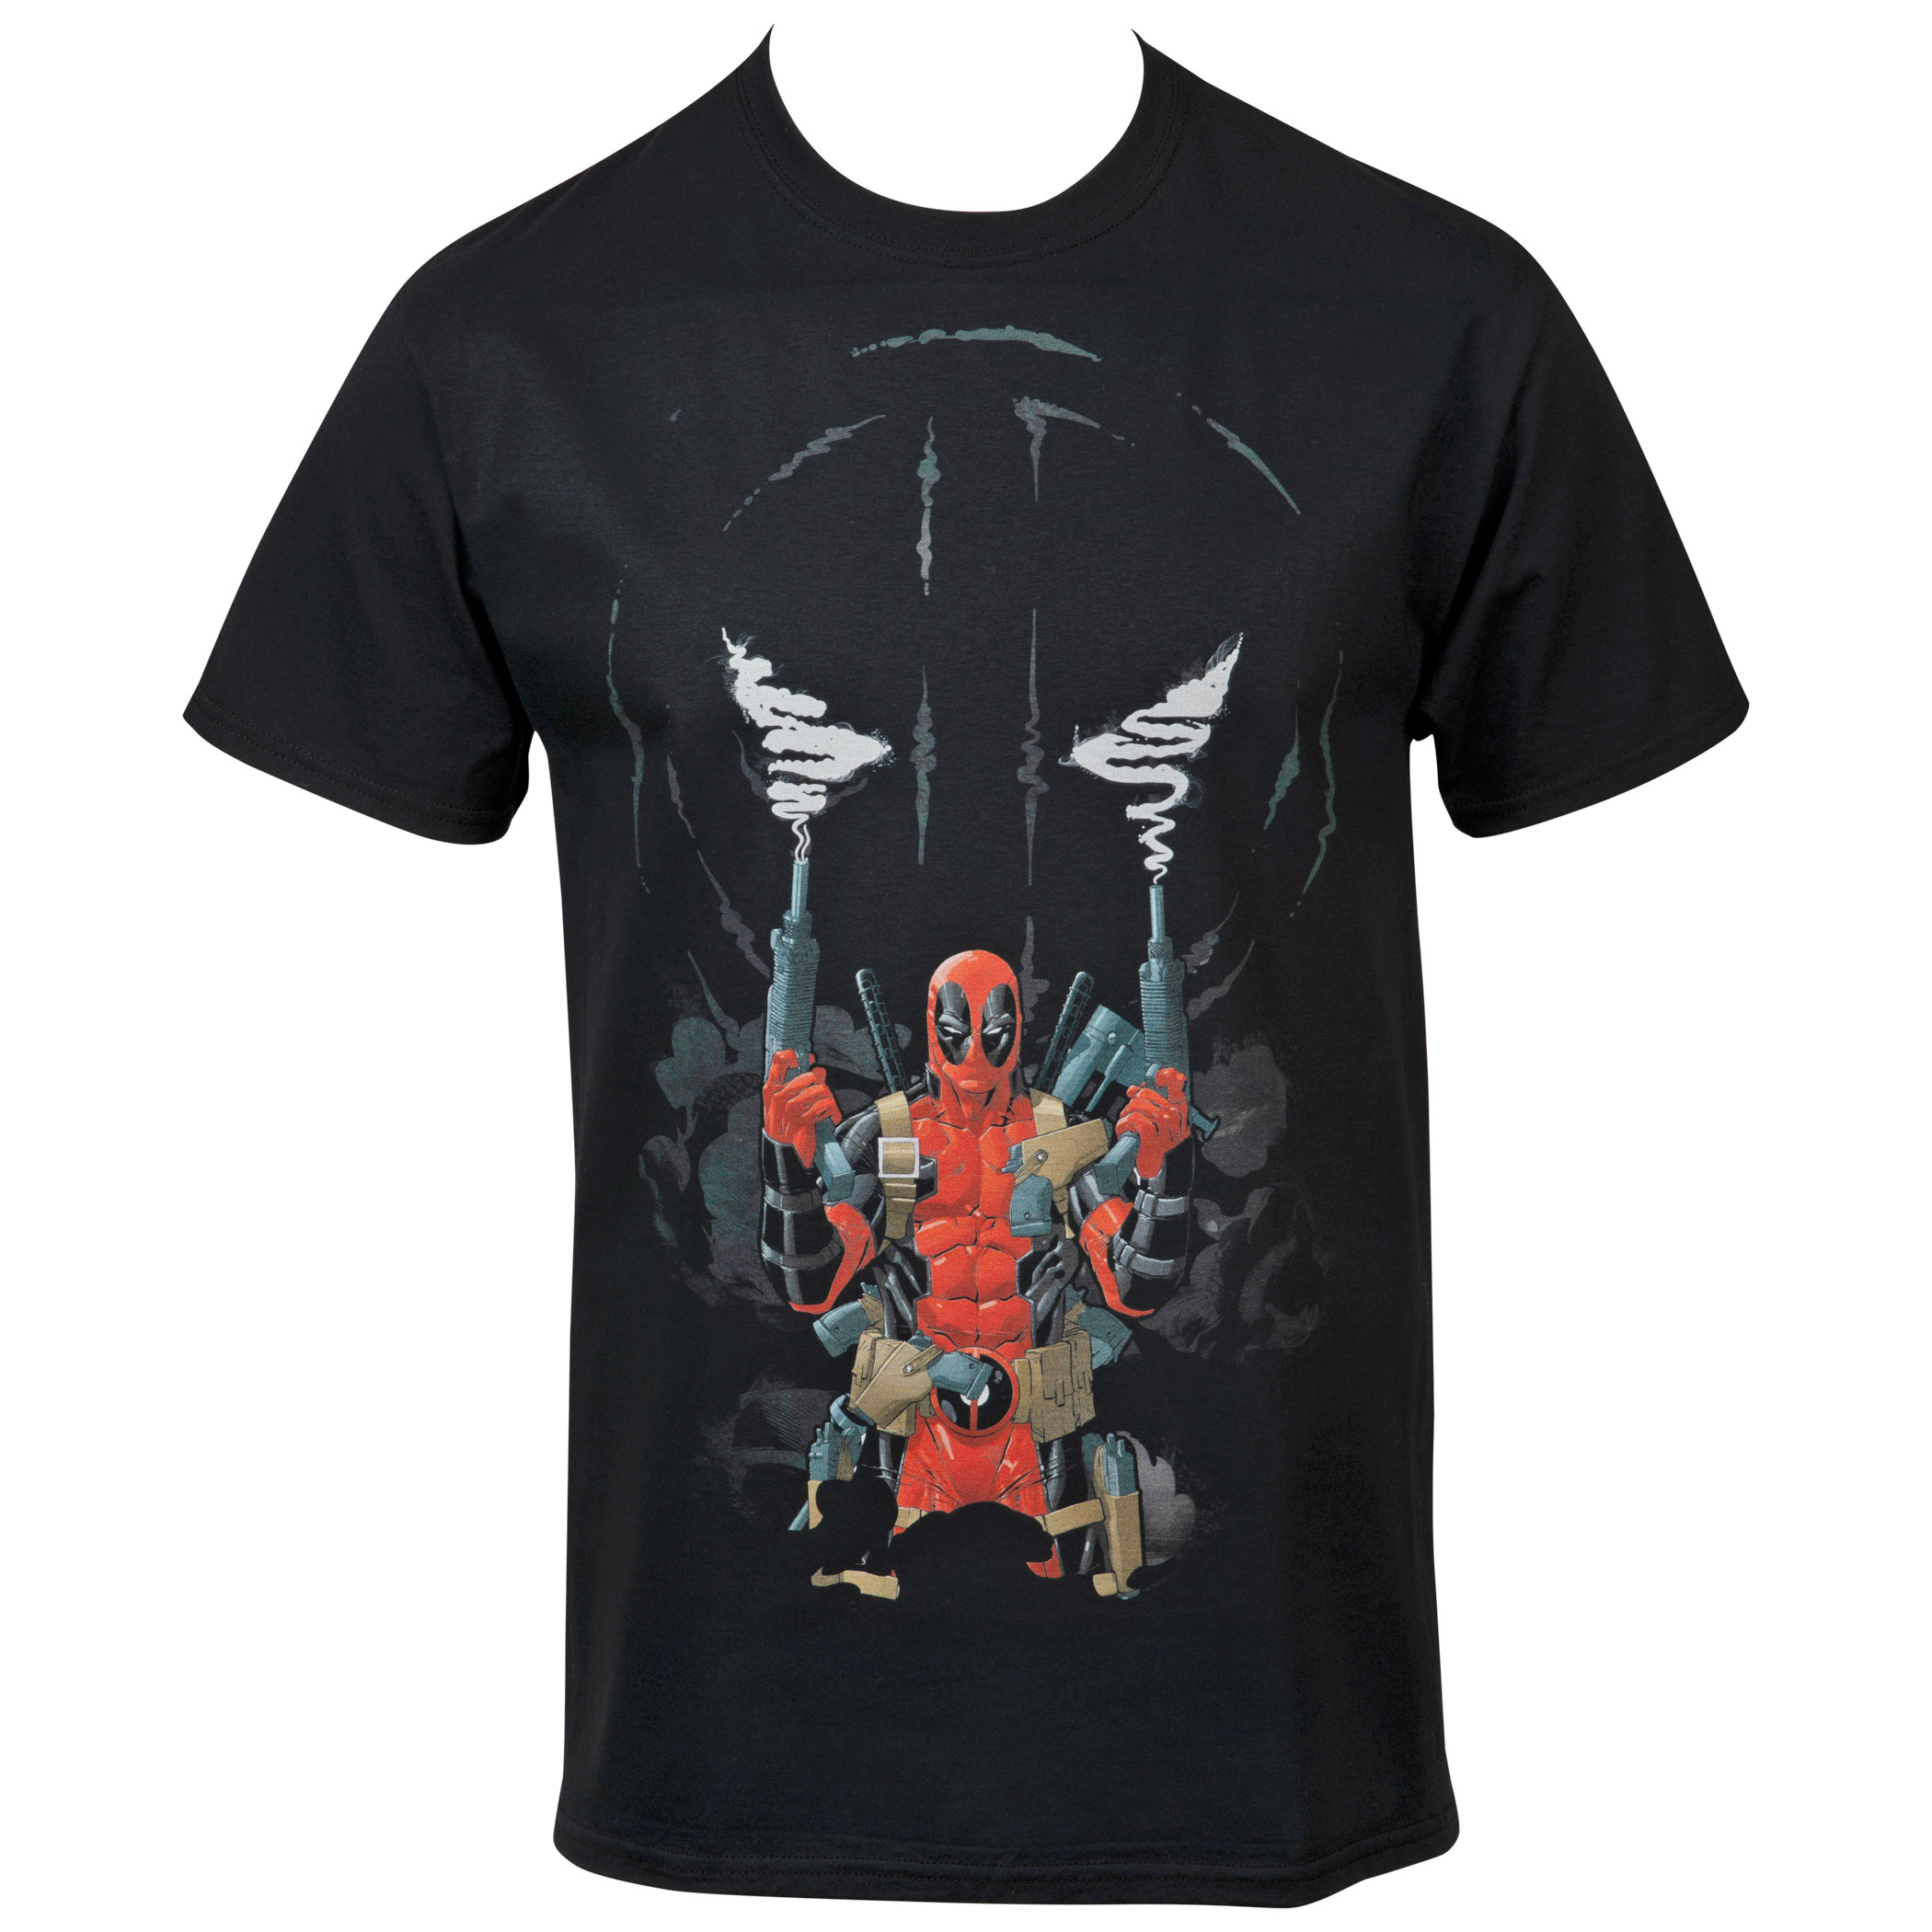 Marvel Deadpool Two Guns and Smoke Symbol T-Shirt